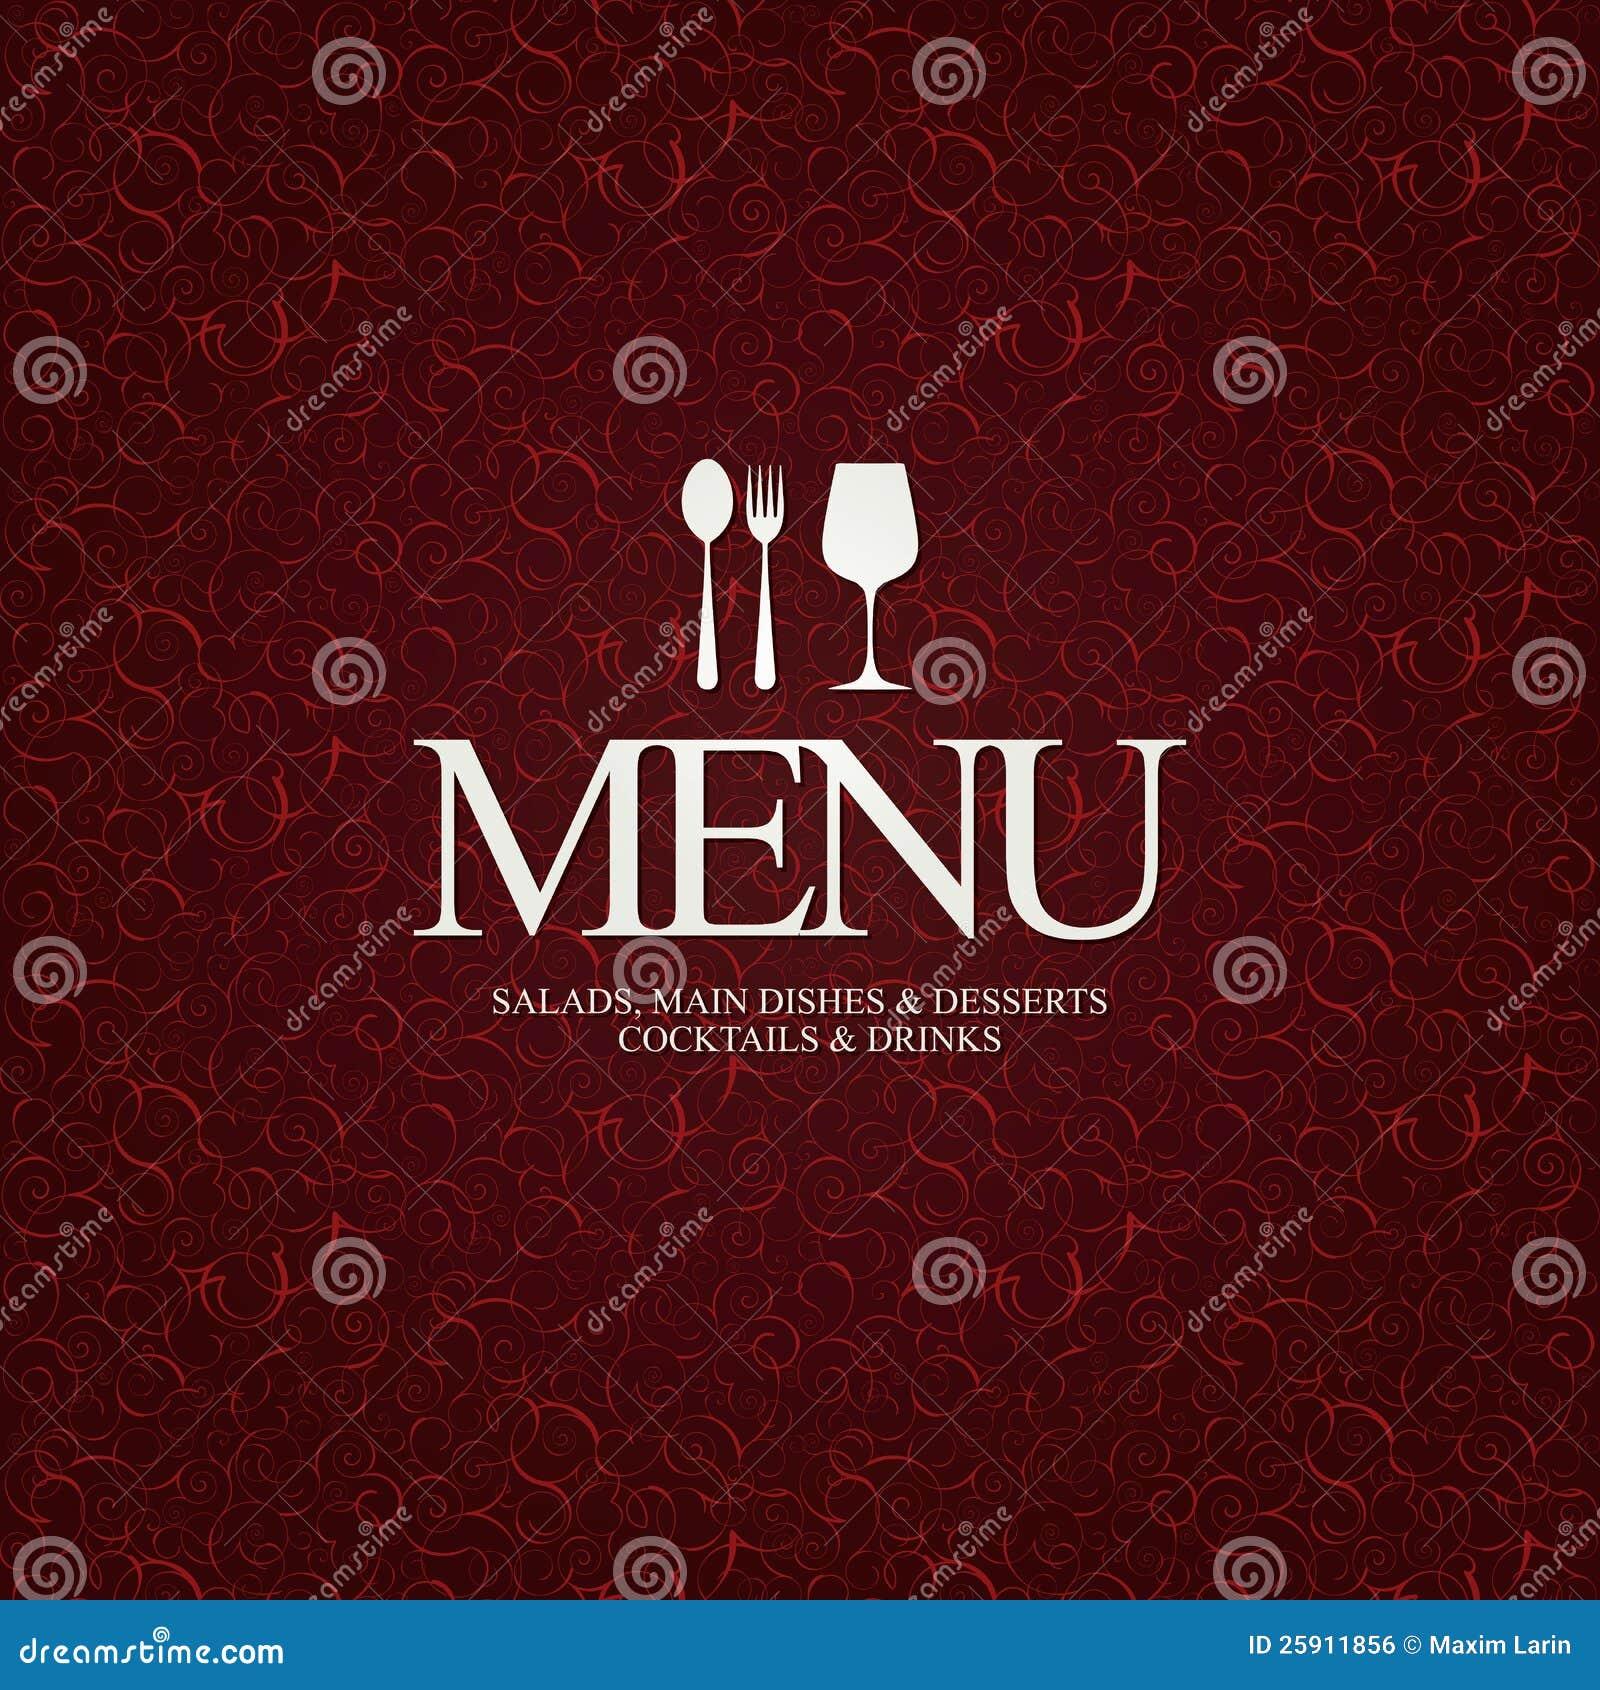 restaurant menu design royalty free stock image - image: 25911856